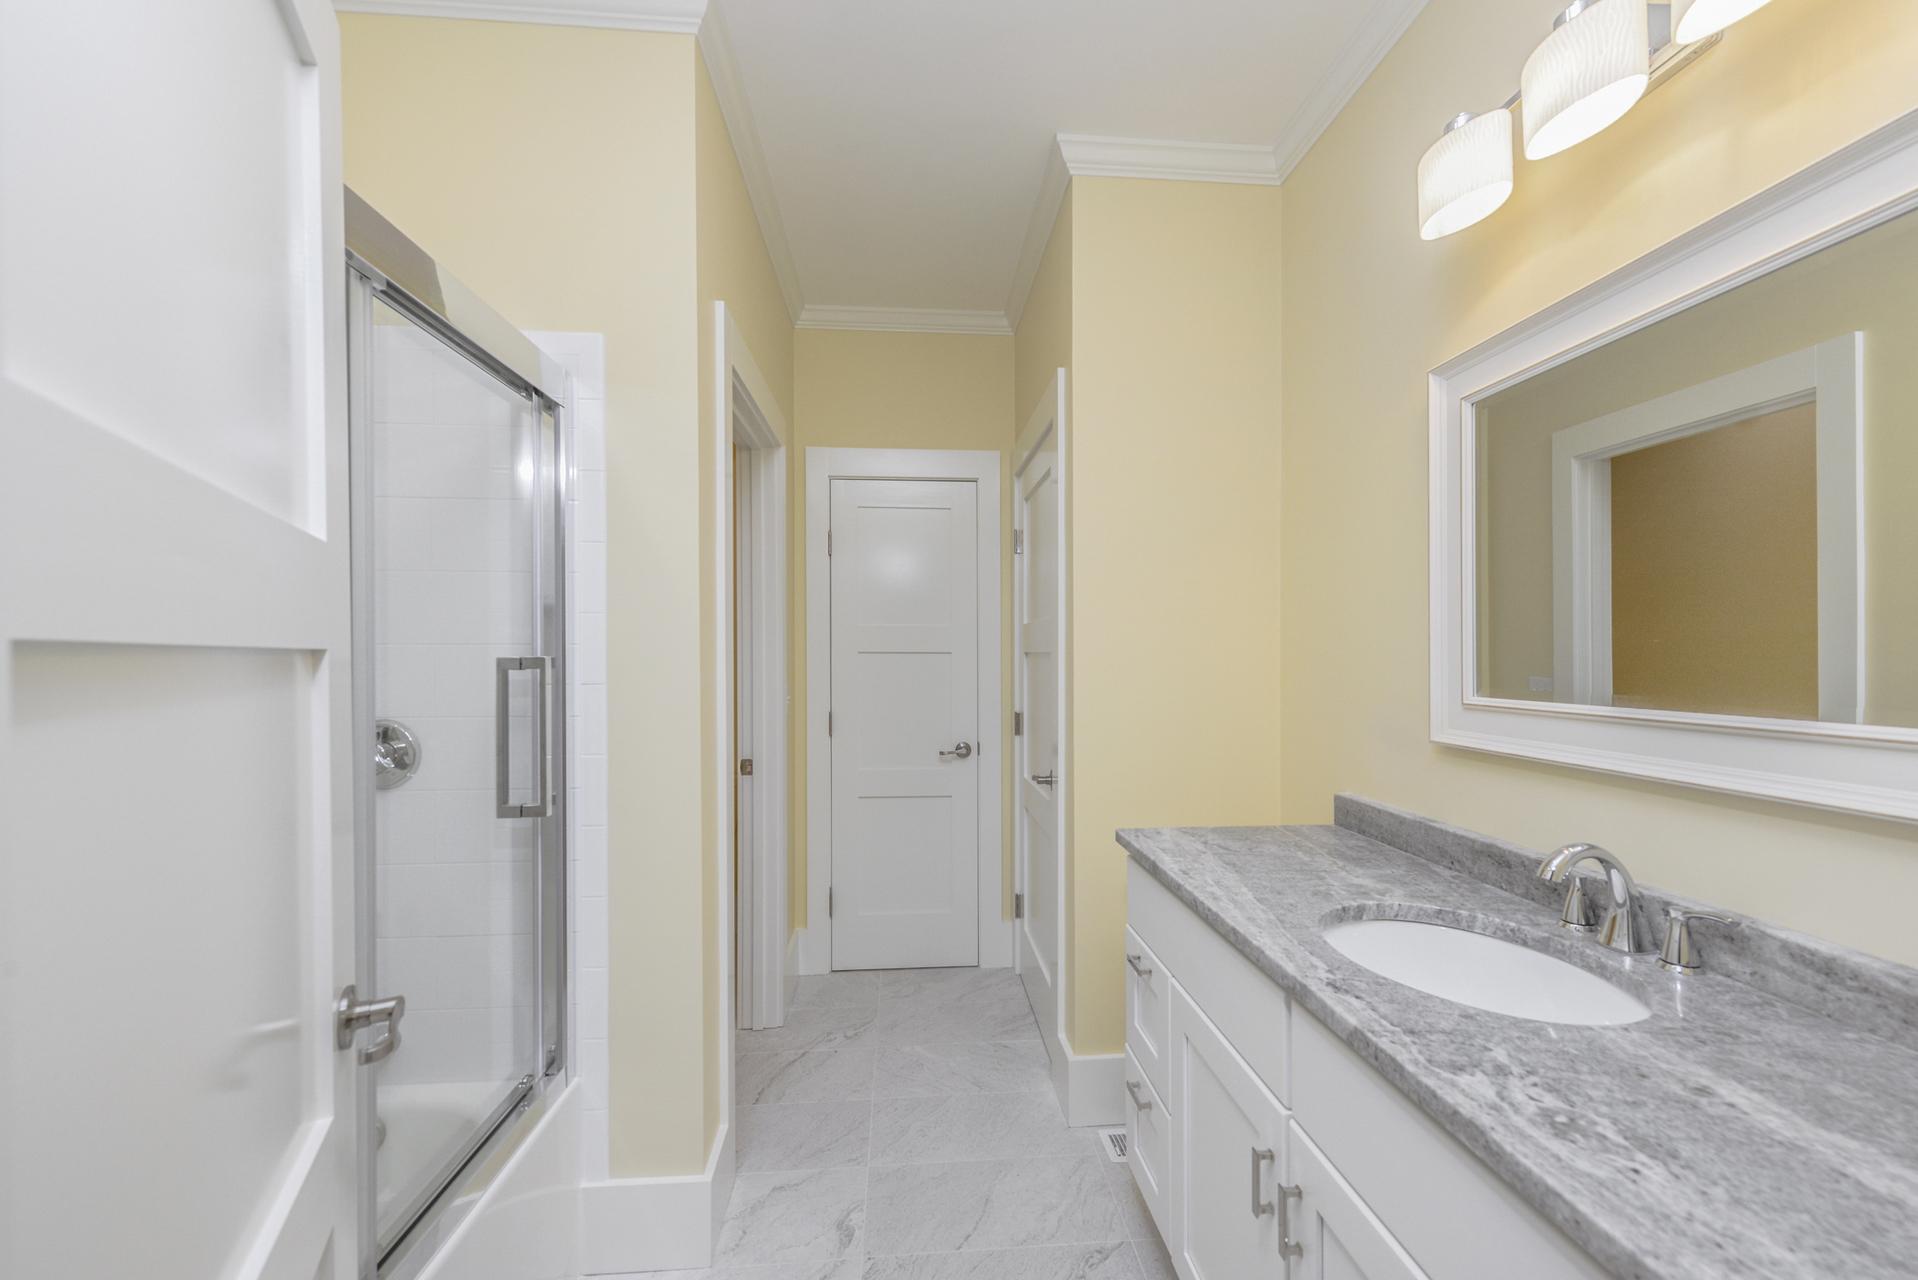 015-photo-bathroom-7774176